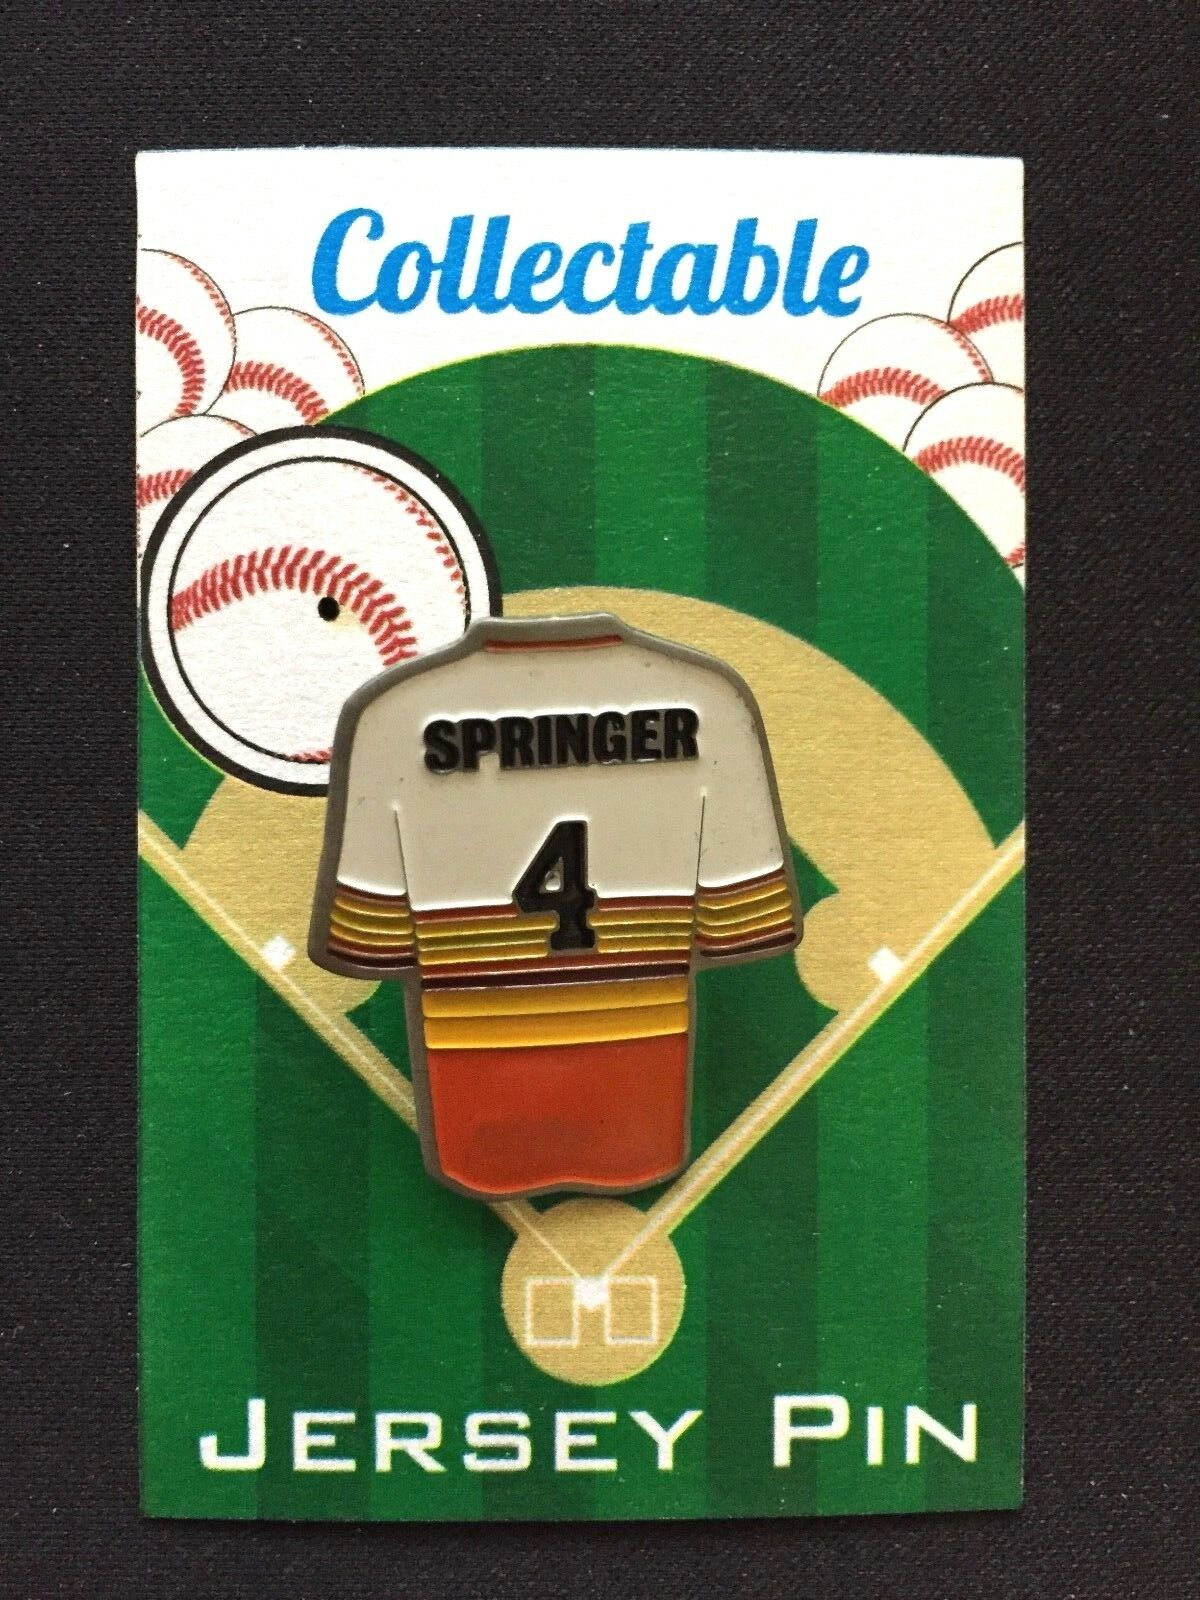 Houston Astros George Springer Revers Pin-World Pin-World Pin-World Serie Champion  1 Sammelobjekt b33c8f